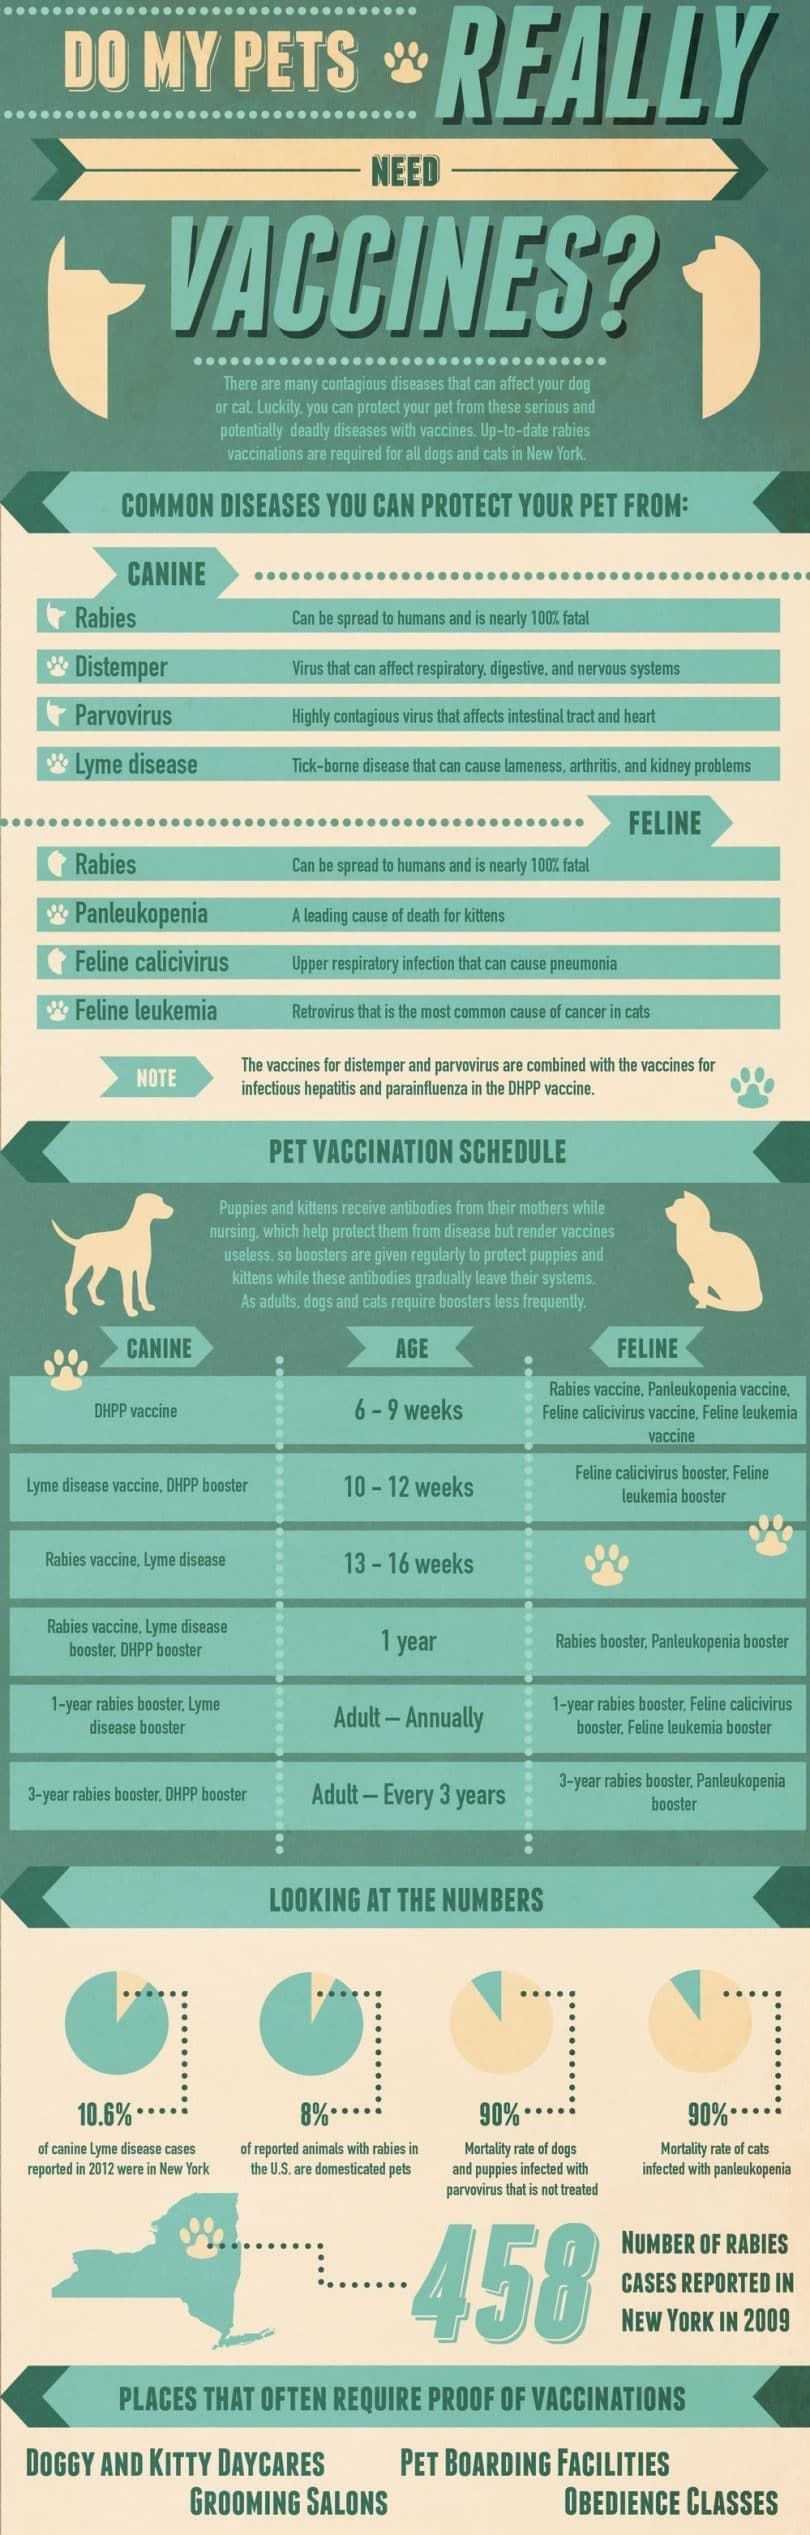 Do my pets really need vaccines